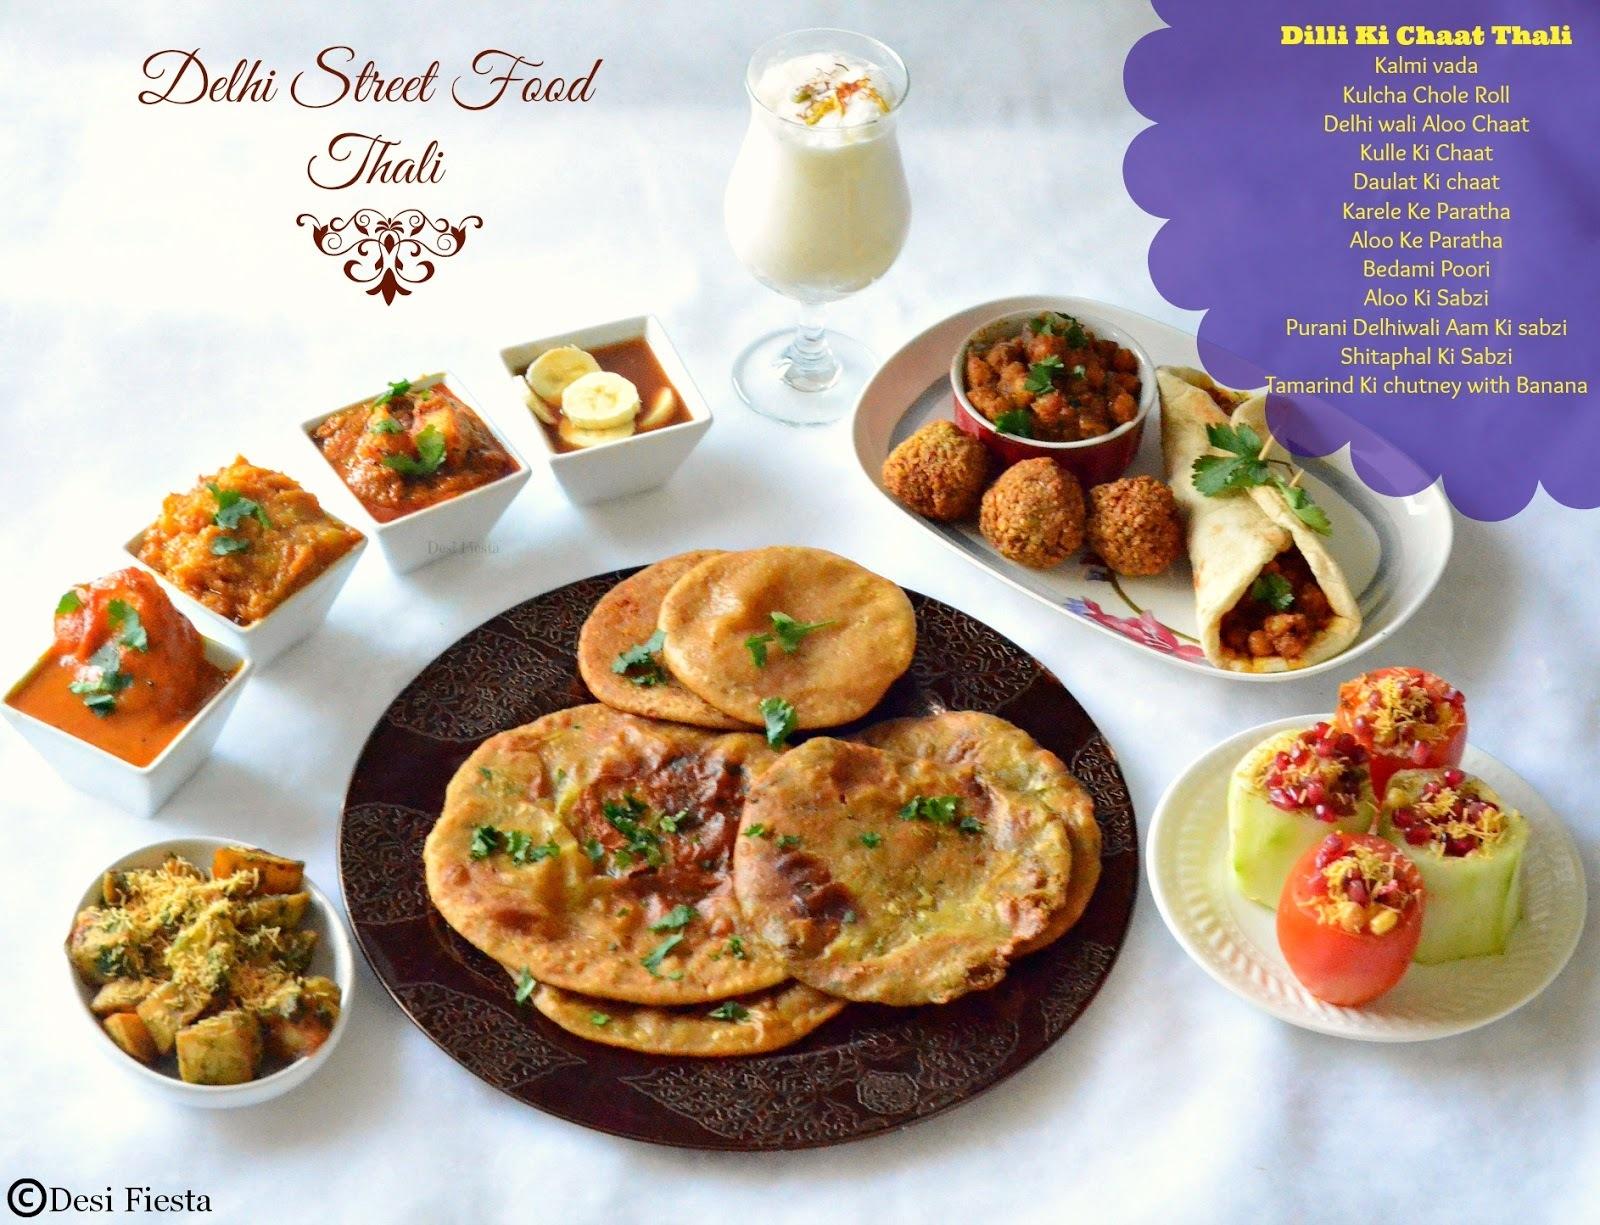 Delhi StreetFood/ Chaat Thali  |Delhi Chaats